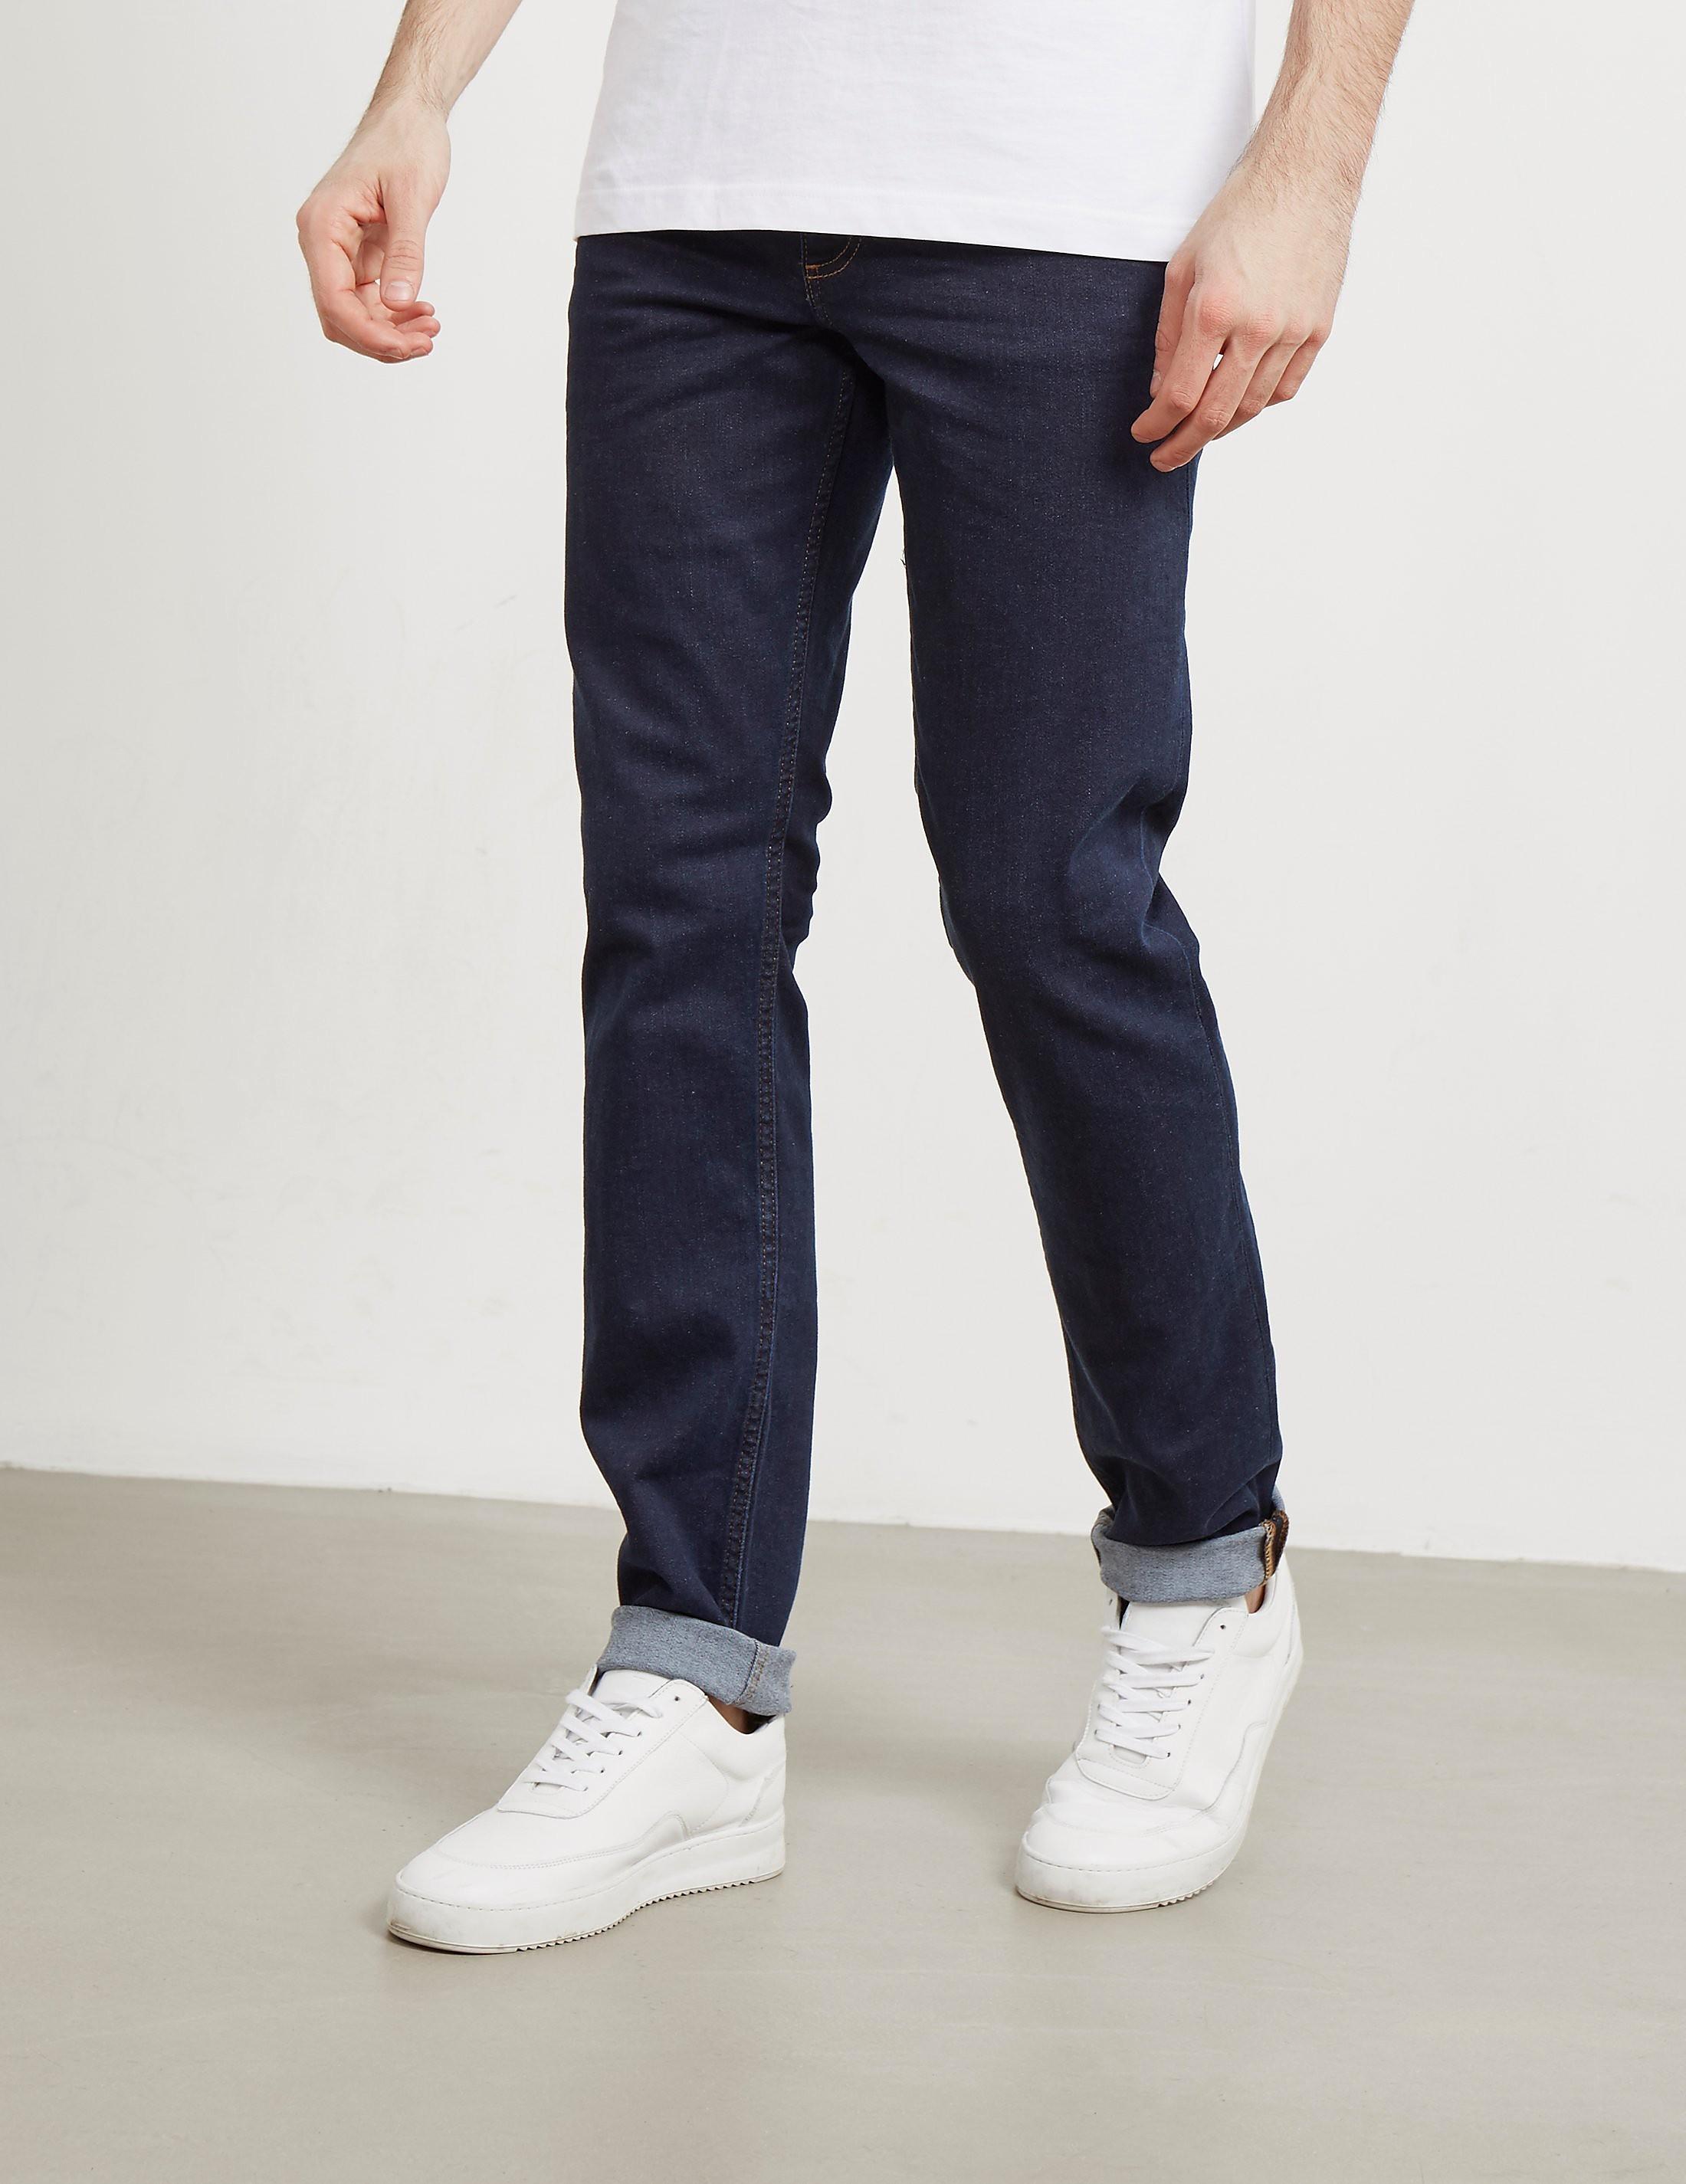 Versace Tiger Slim Jeans